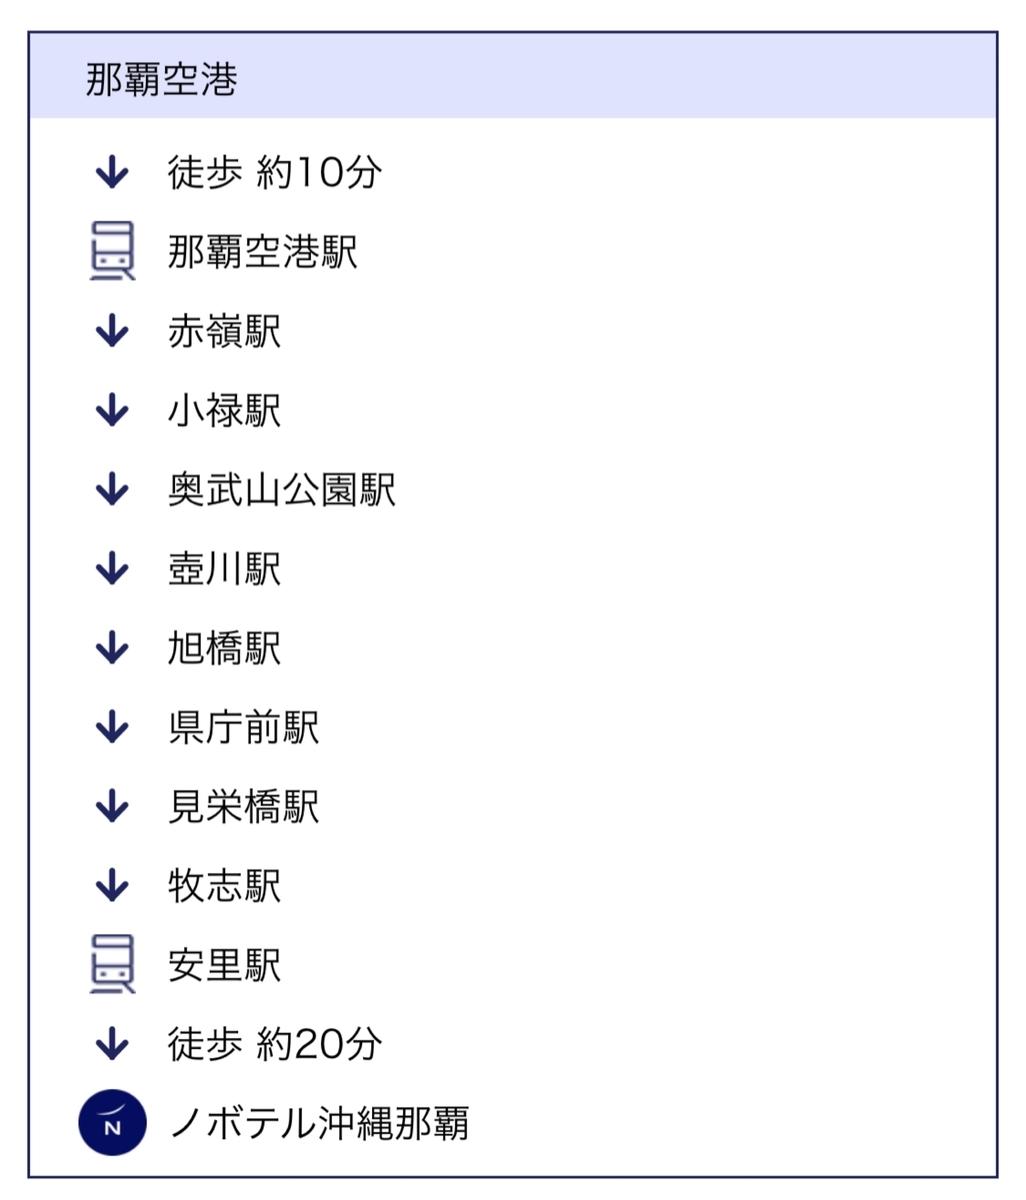 f:id:Nagoya1976:20210704205928j:plain